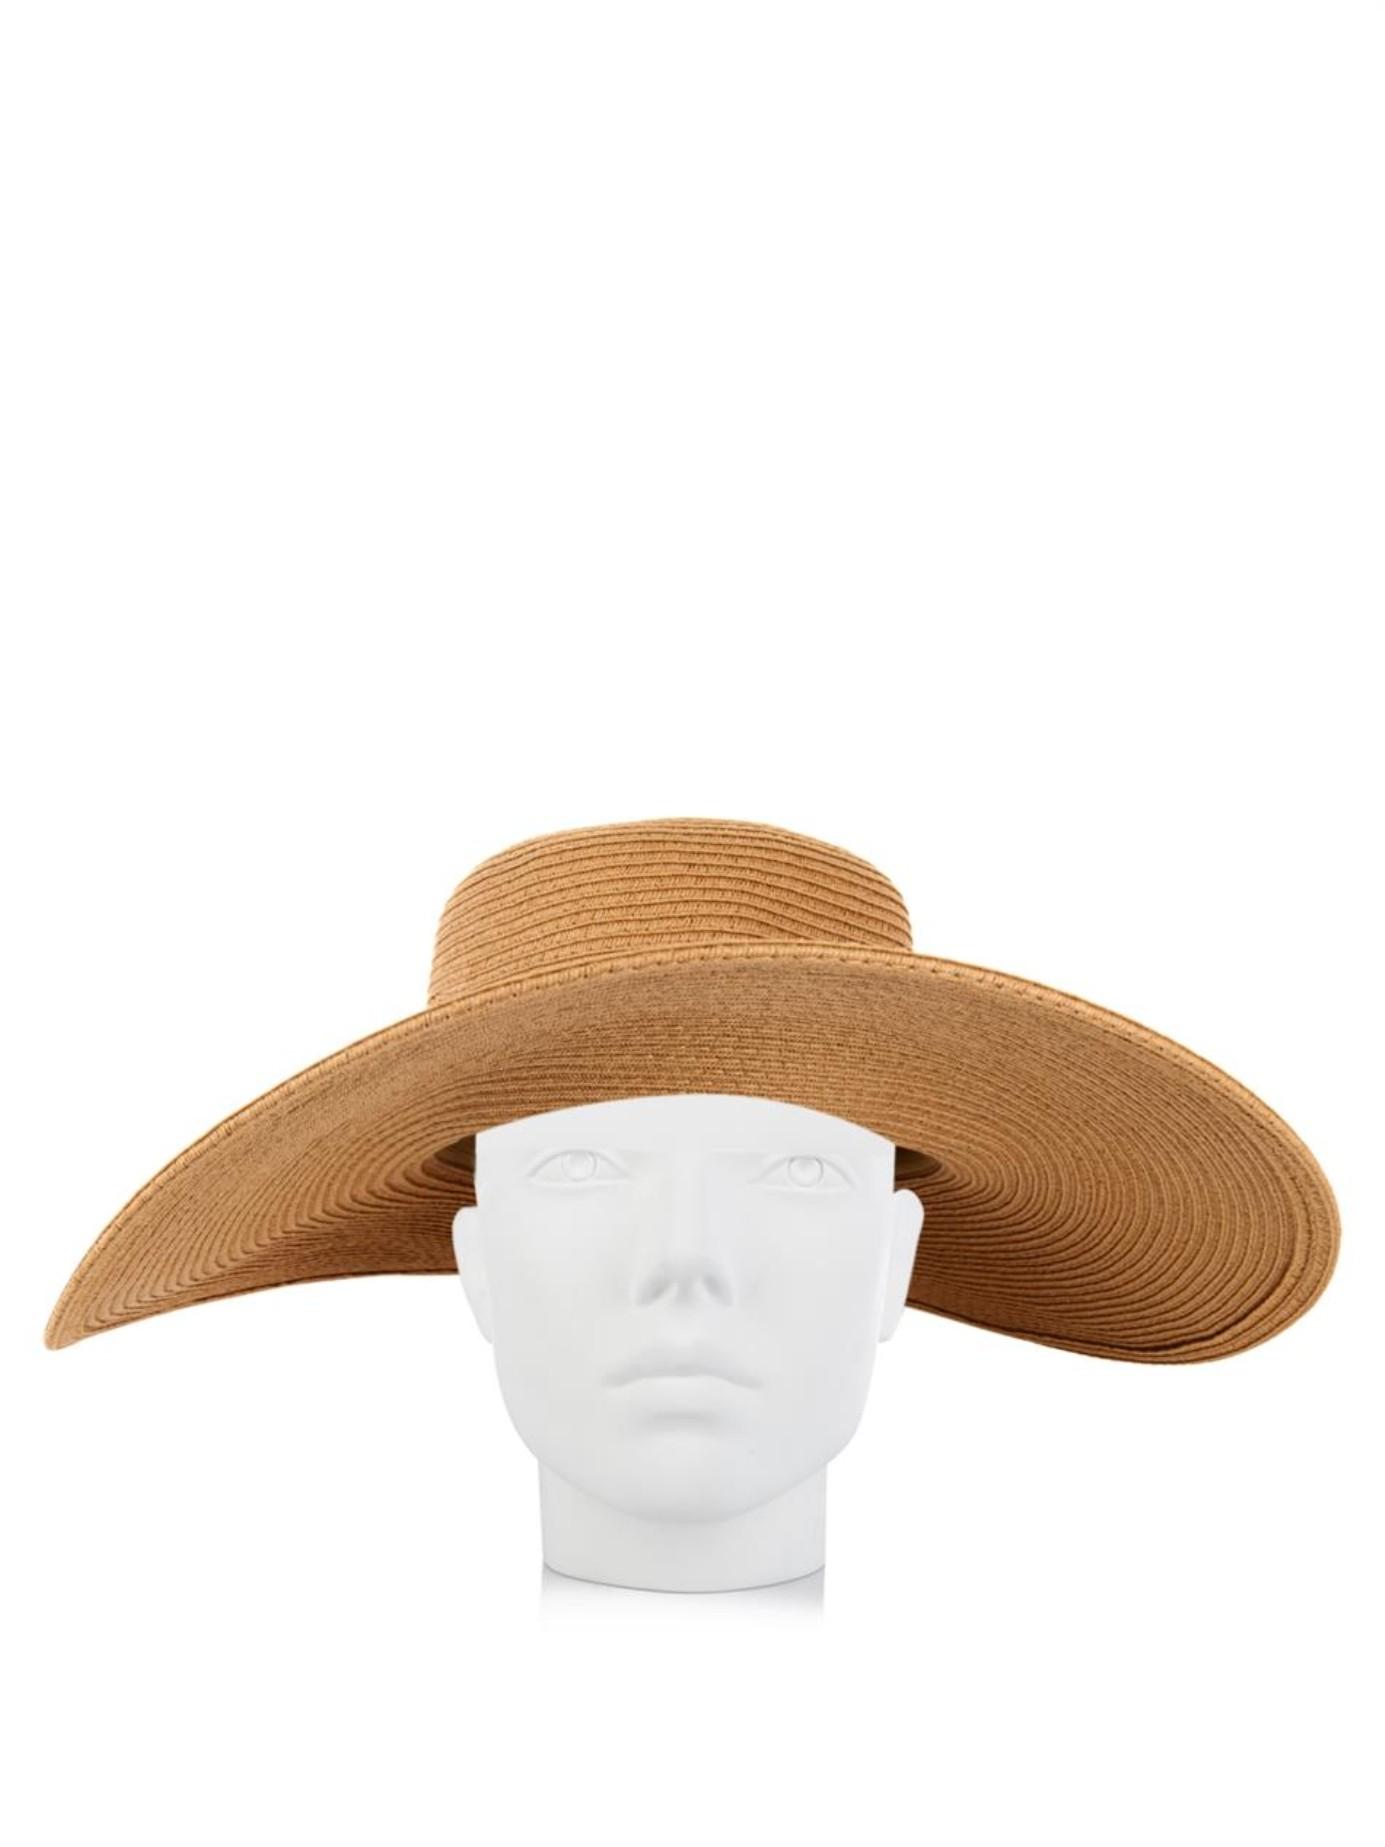 41f15963da8 Lyst - Melissa Odabash Raffia Sun Hat in Brown